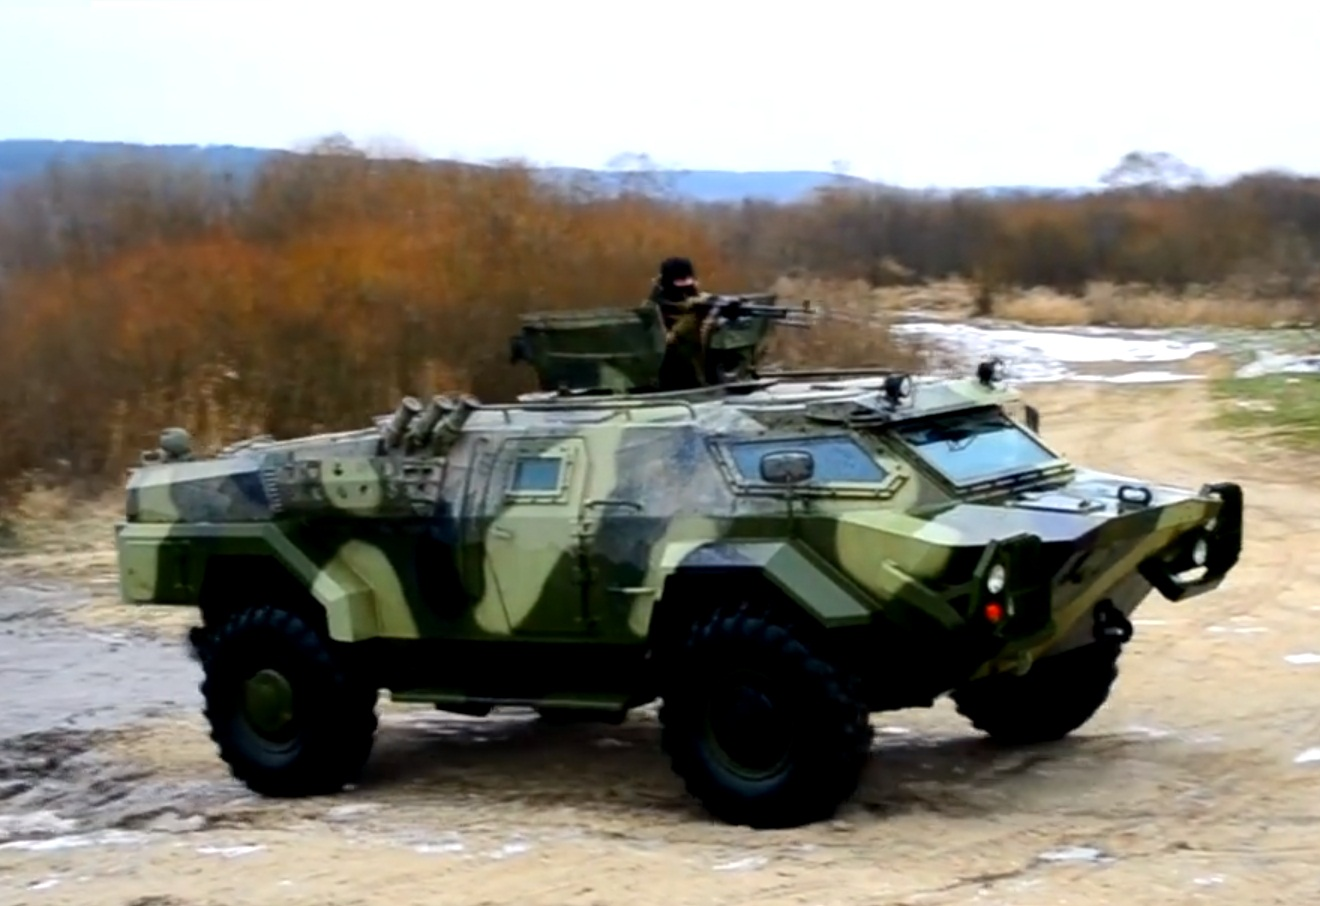 Belarus Armed Forces - Page 5 P1affrq872ve2ap0nm51u9k1hcl1